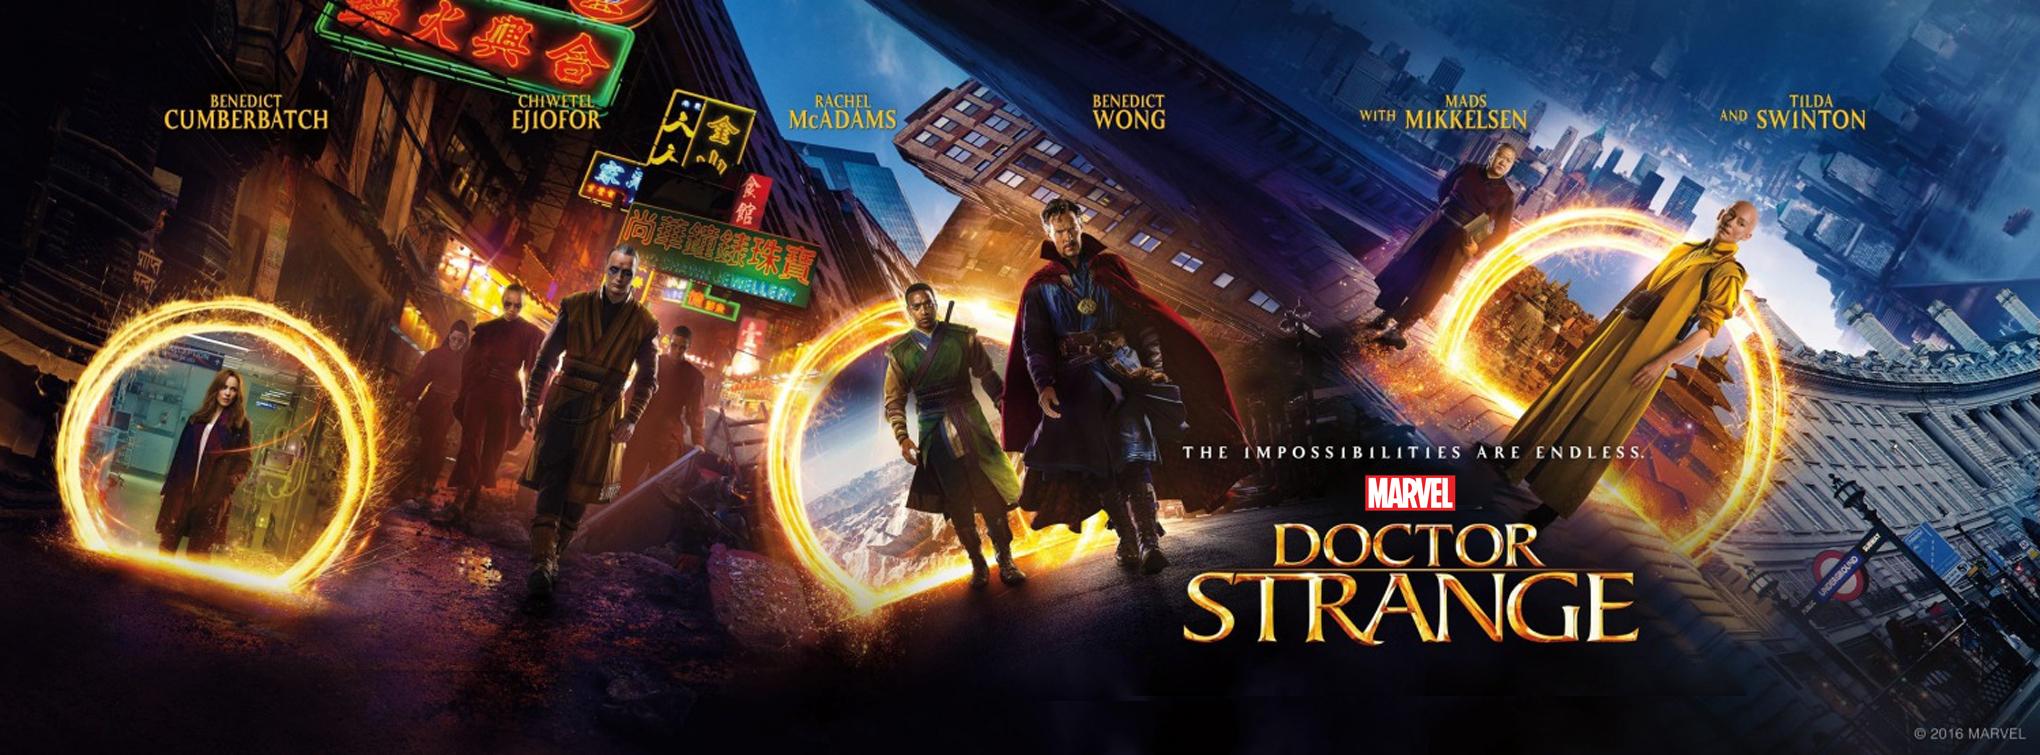 Doctor Strange premiere tickets on sale now!